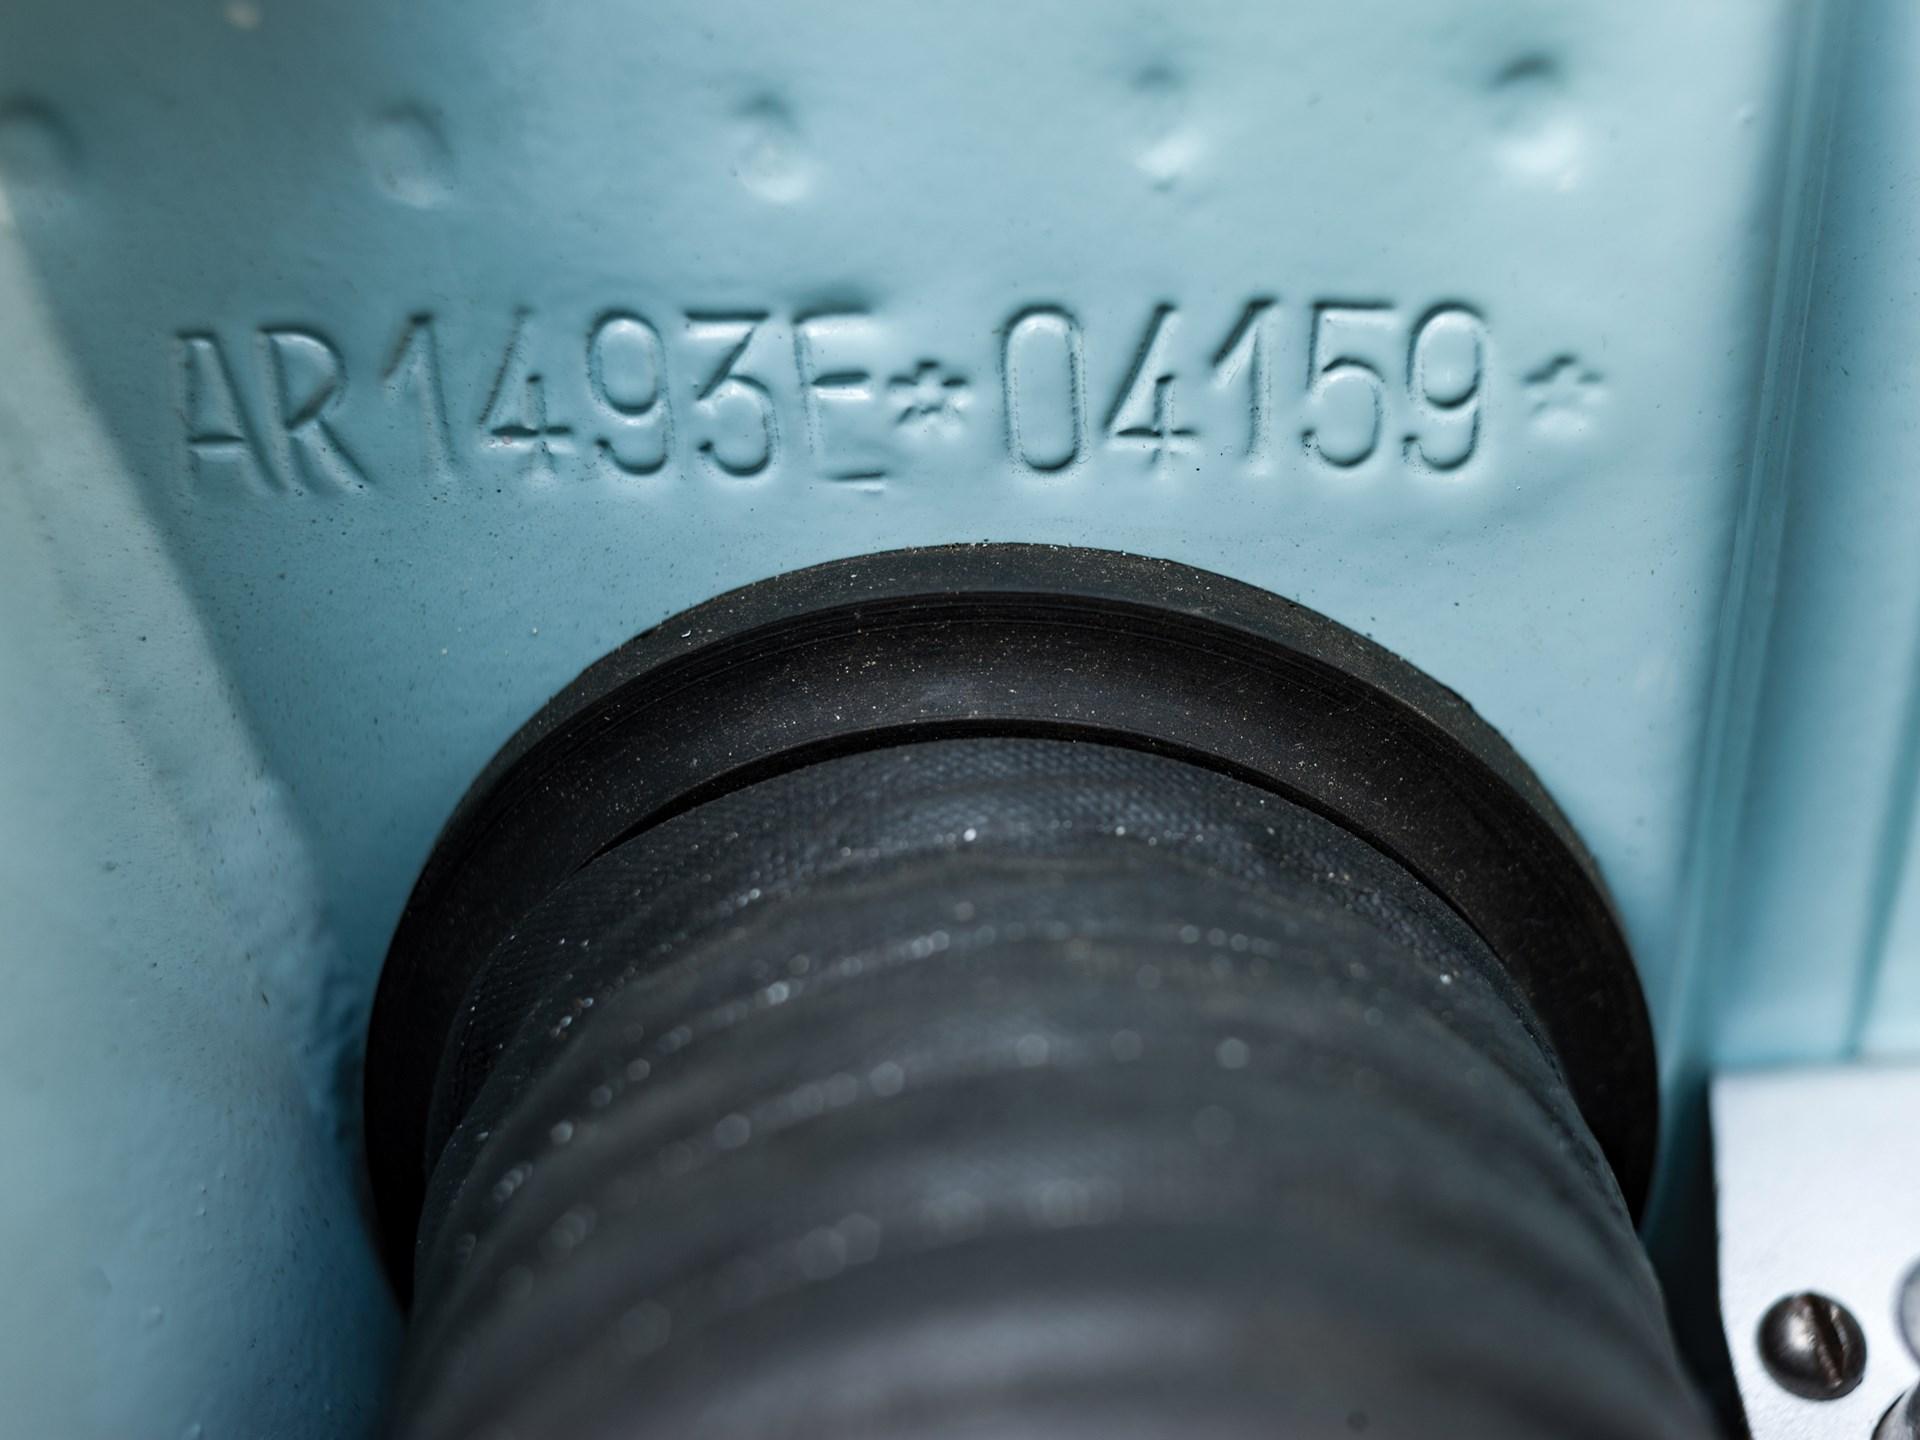 1/50, f 4, iso50 with a {lens type} at 35 mm on a Canon EOS-1Ds Mark III.  Ph: Cymon Taylor